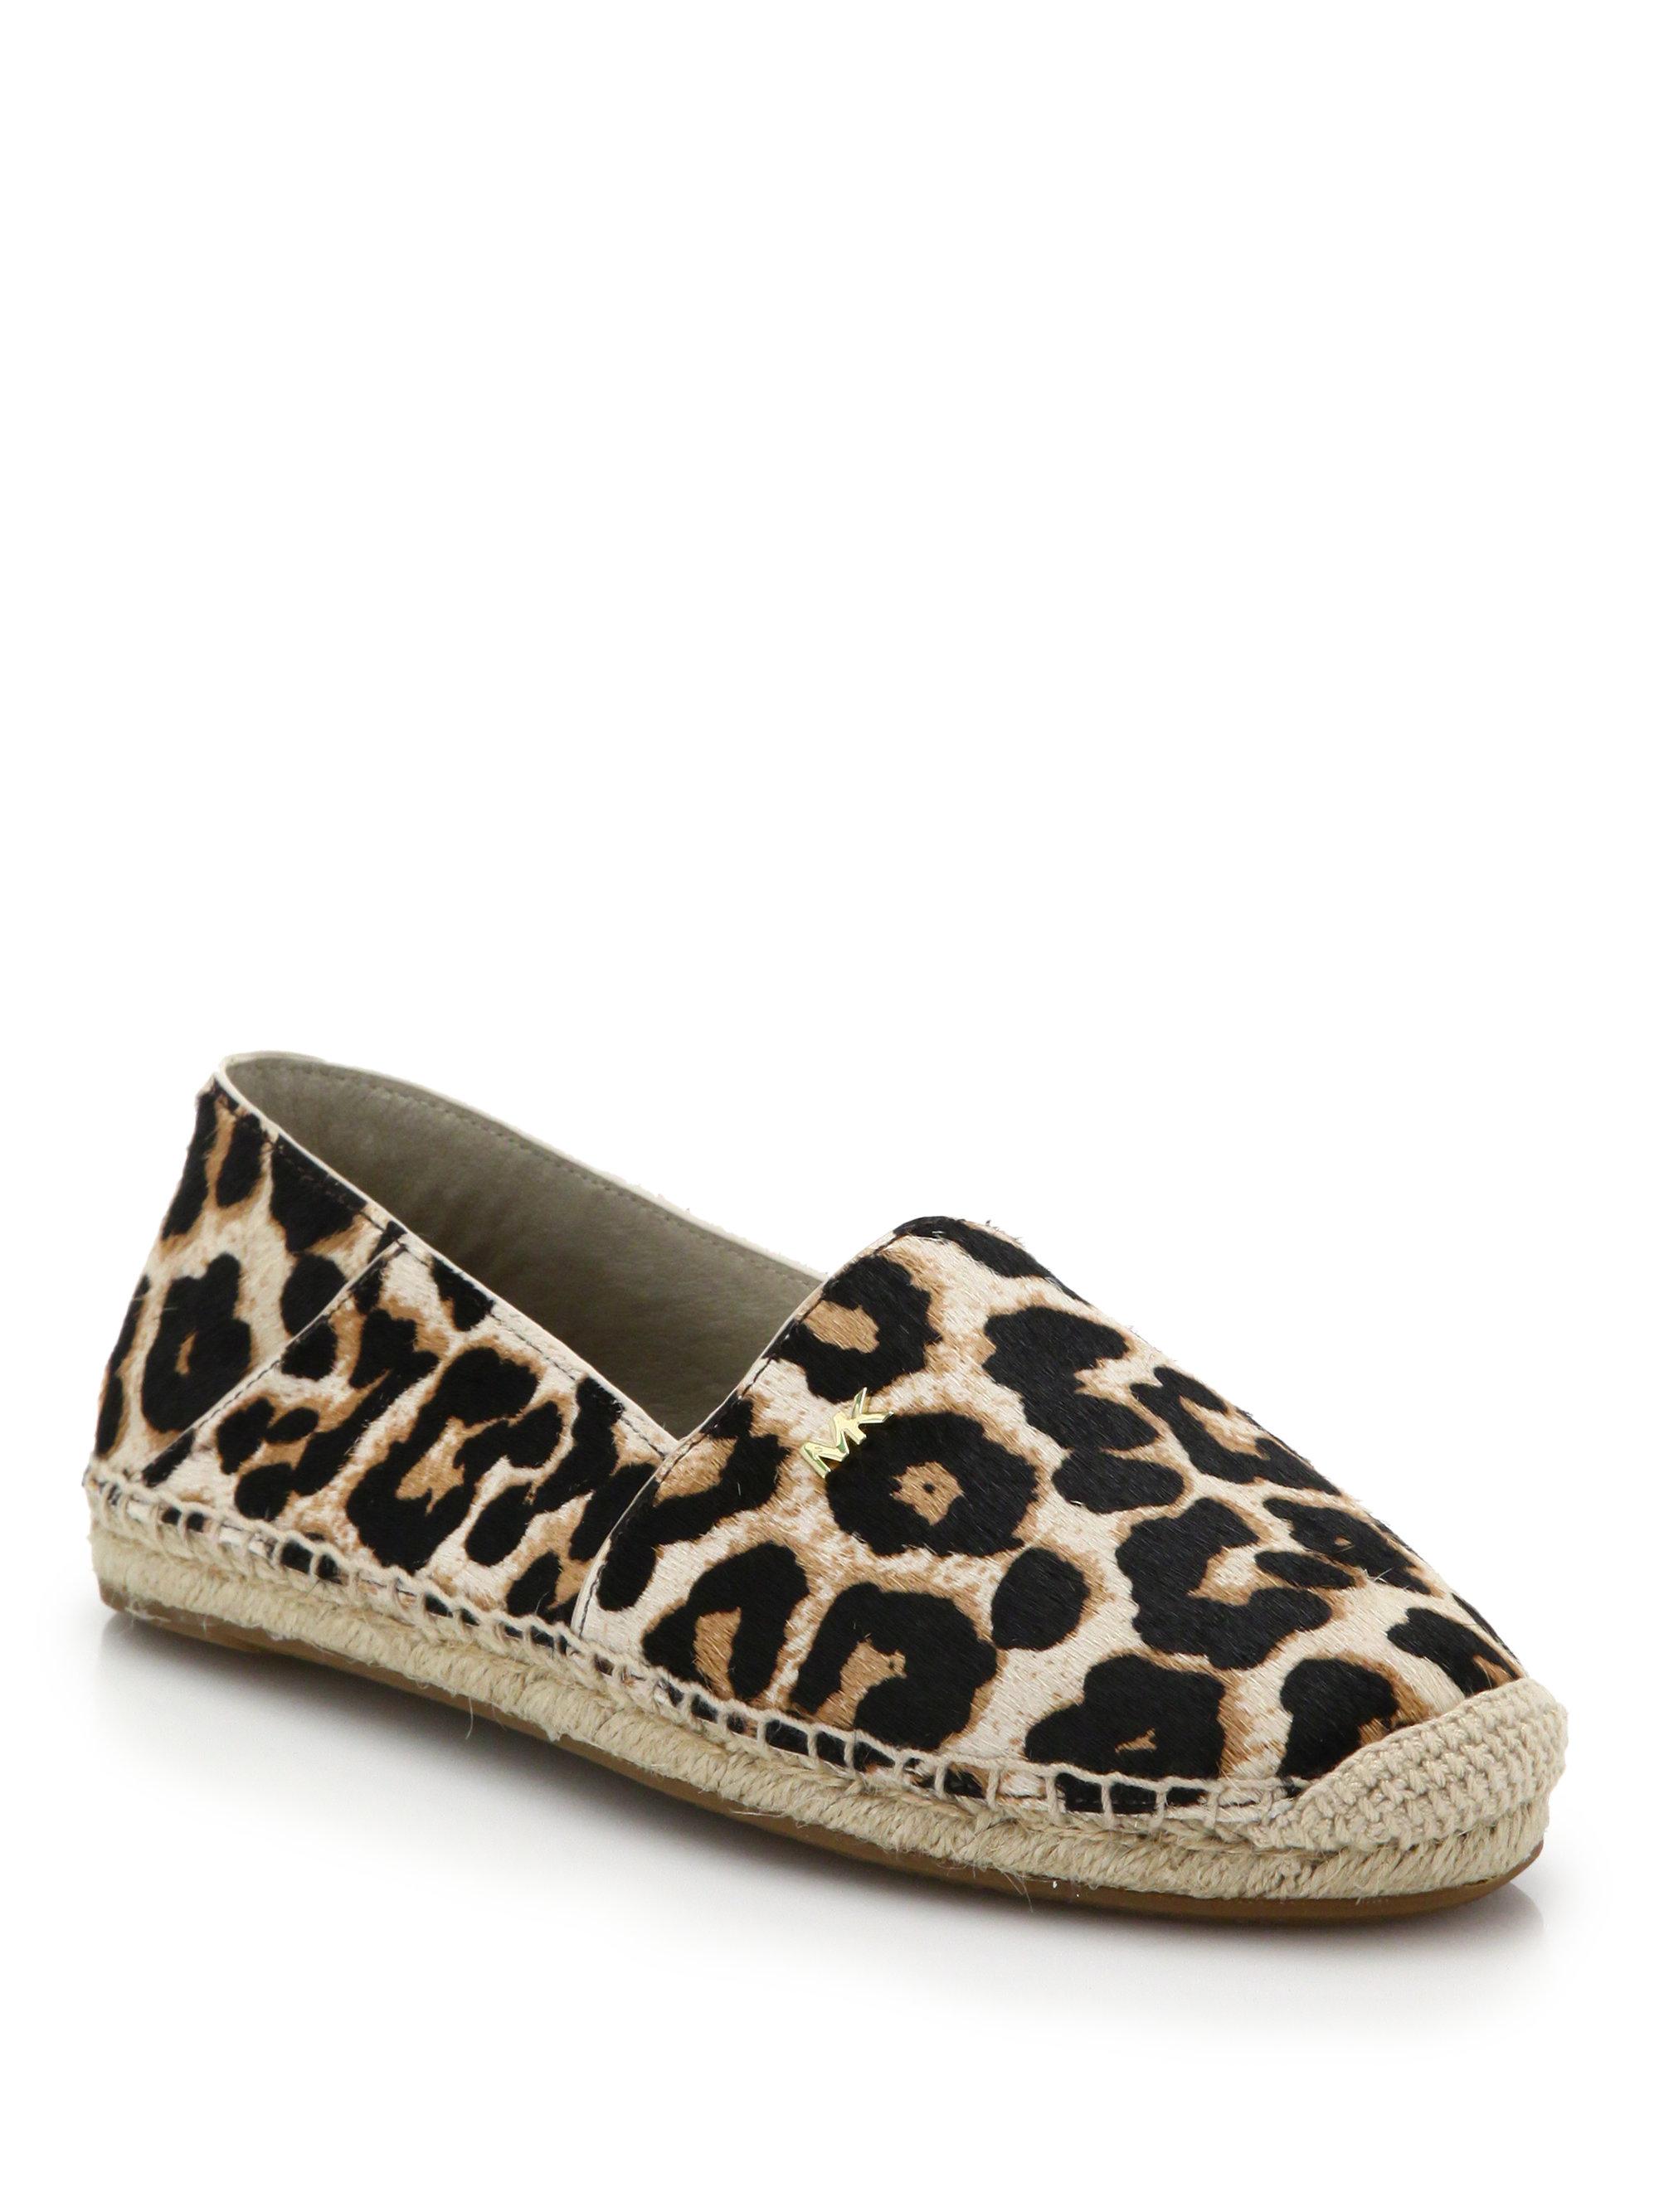 Lyst Michael Michael Kors Leopard Print Calf Hair